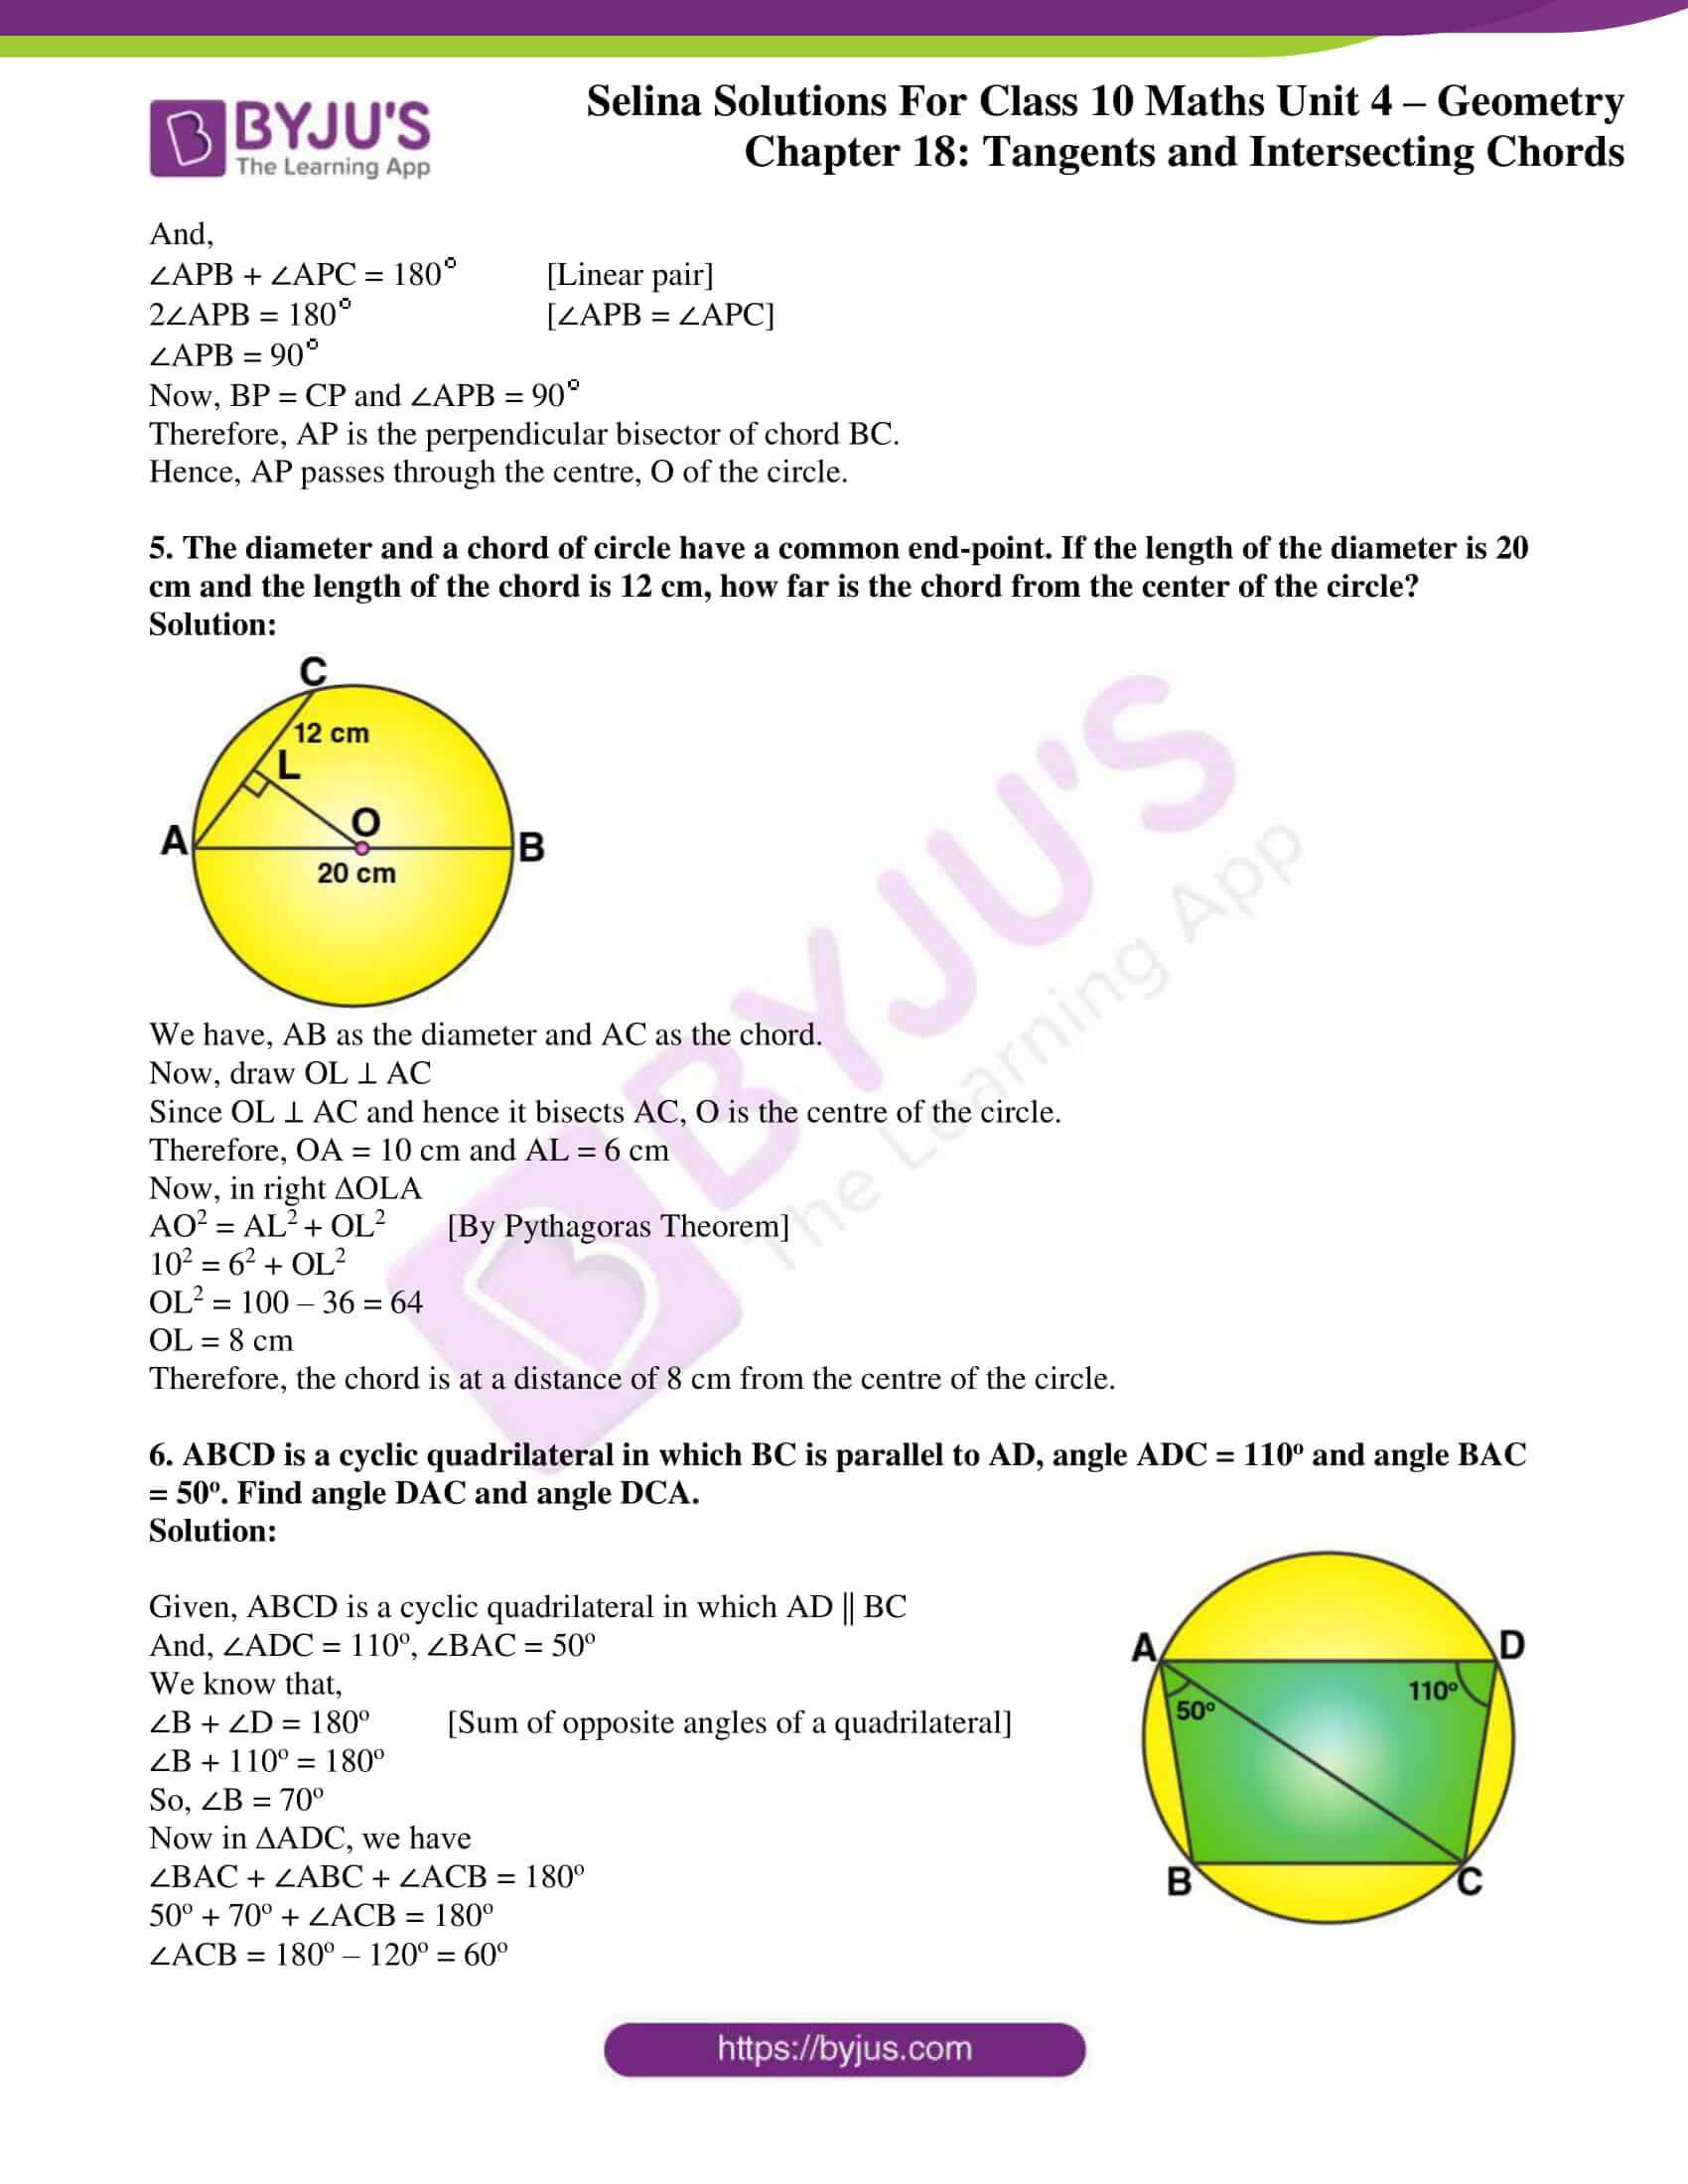 selina-sol-maths-class-10-ch-18-ex-c-03